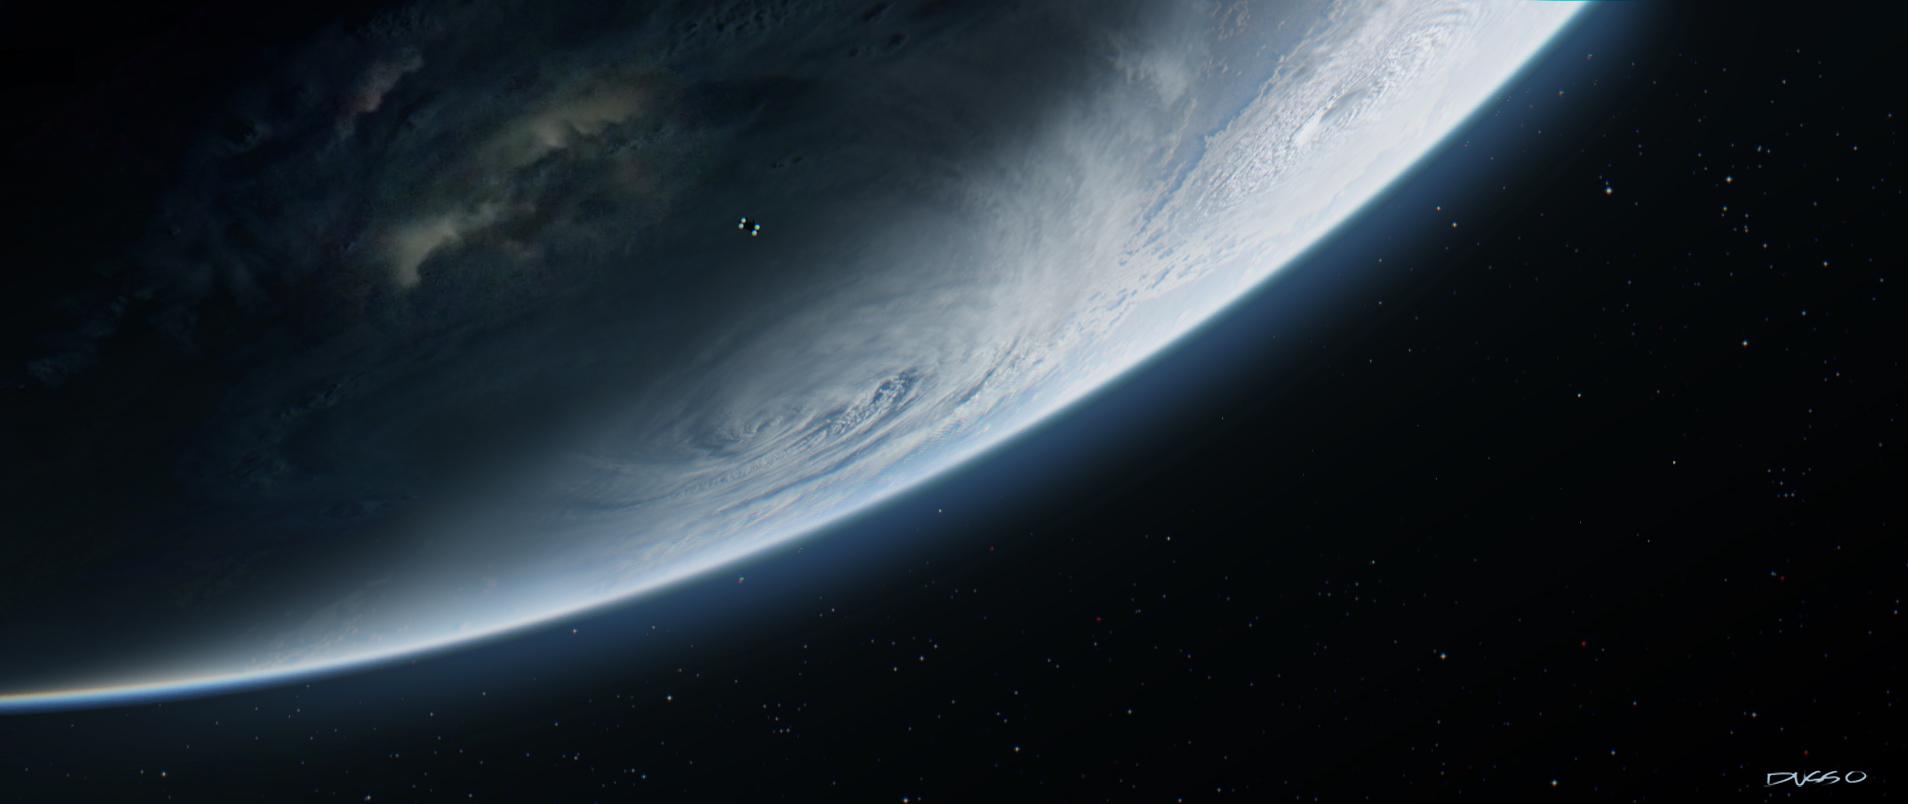 concept-art-dusseault-star-wars-planet-earth